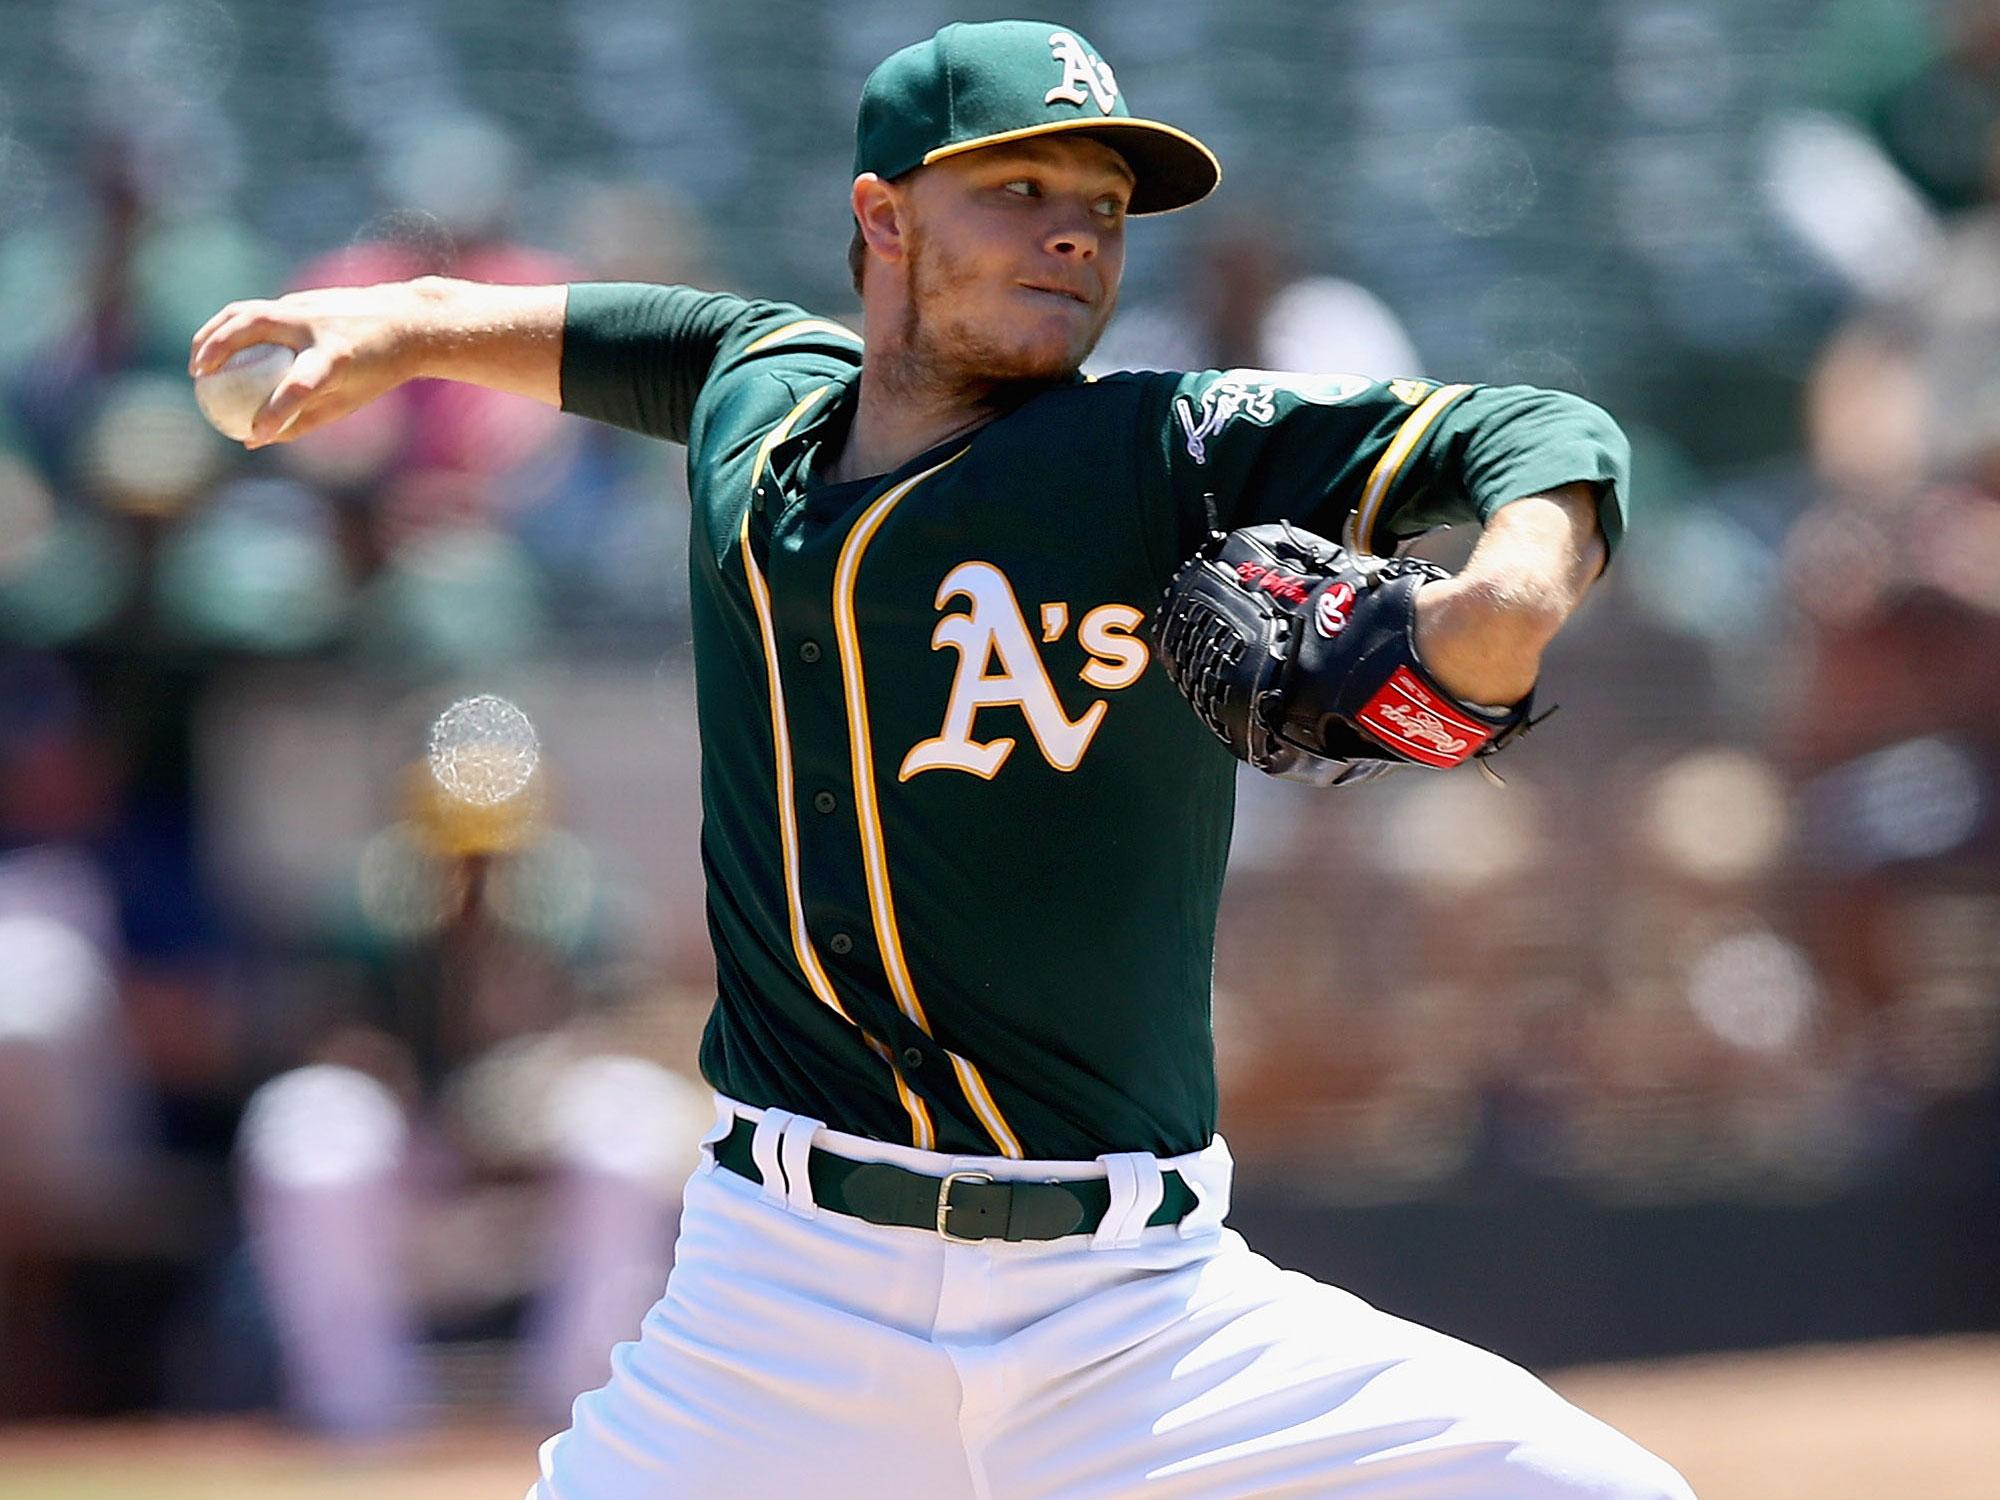 Sonny Gray, Oakland Athletics